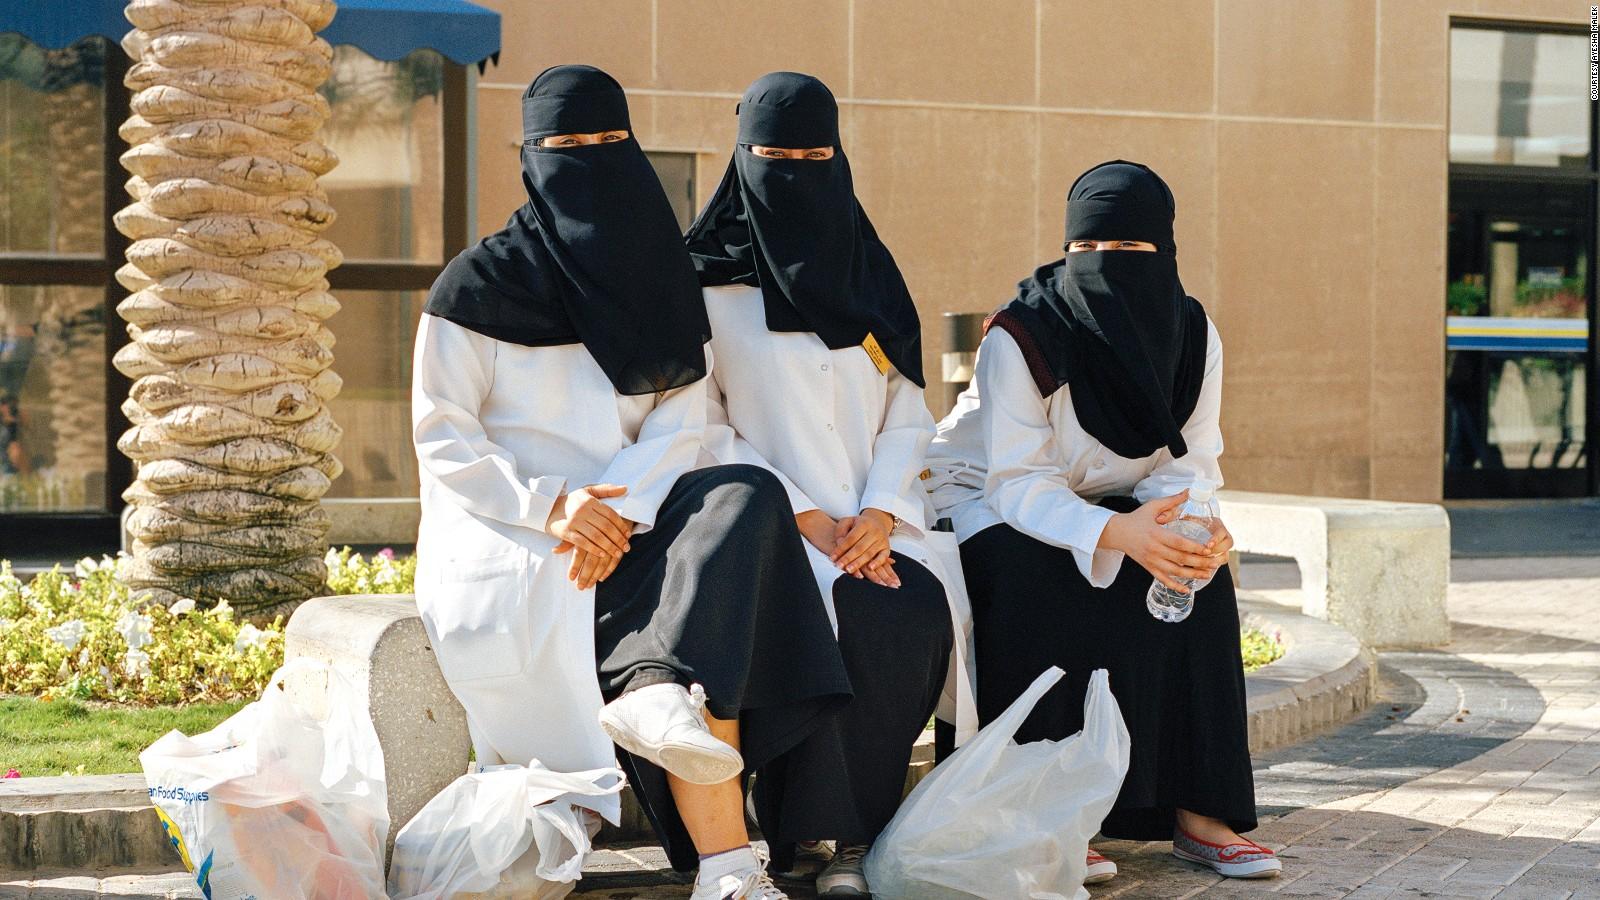 American compound in Saudi Arabia: What's life like inside